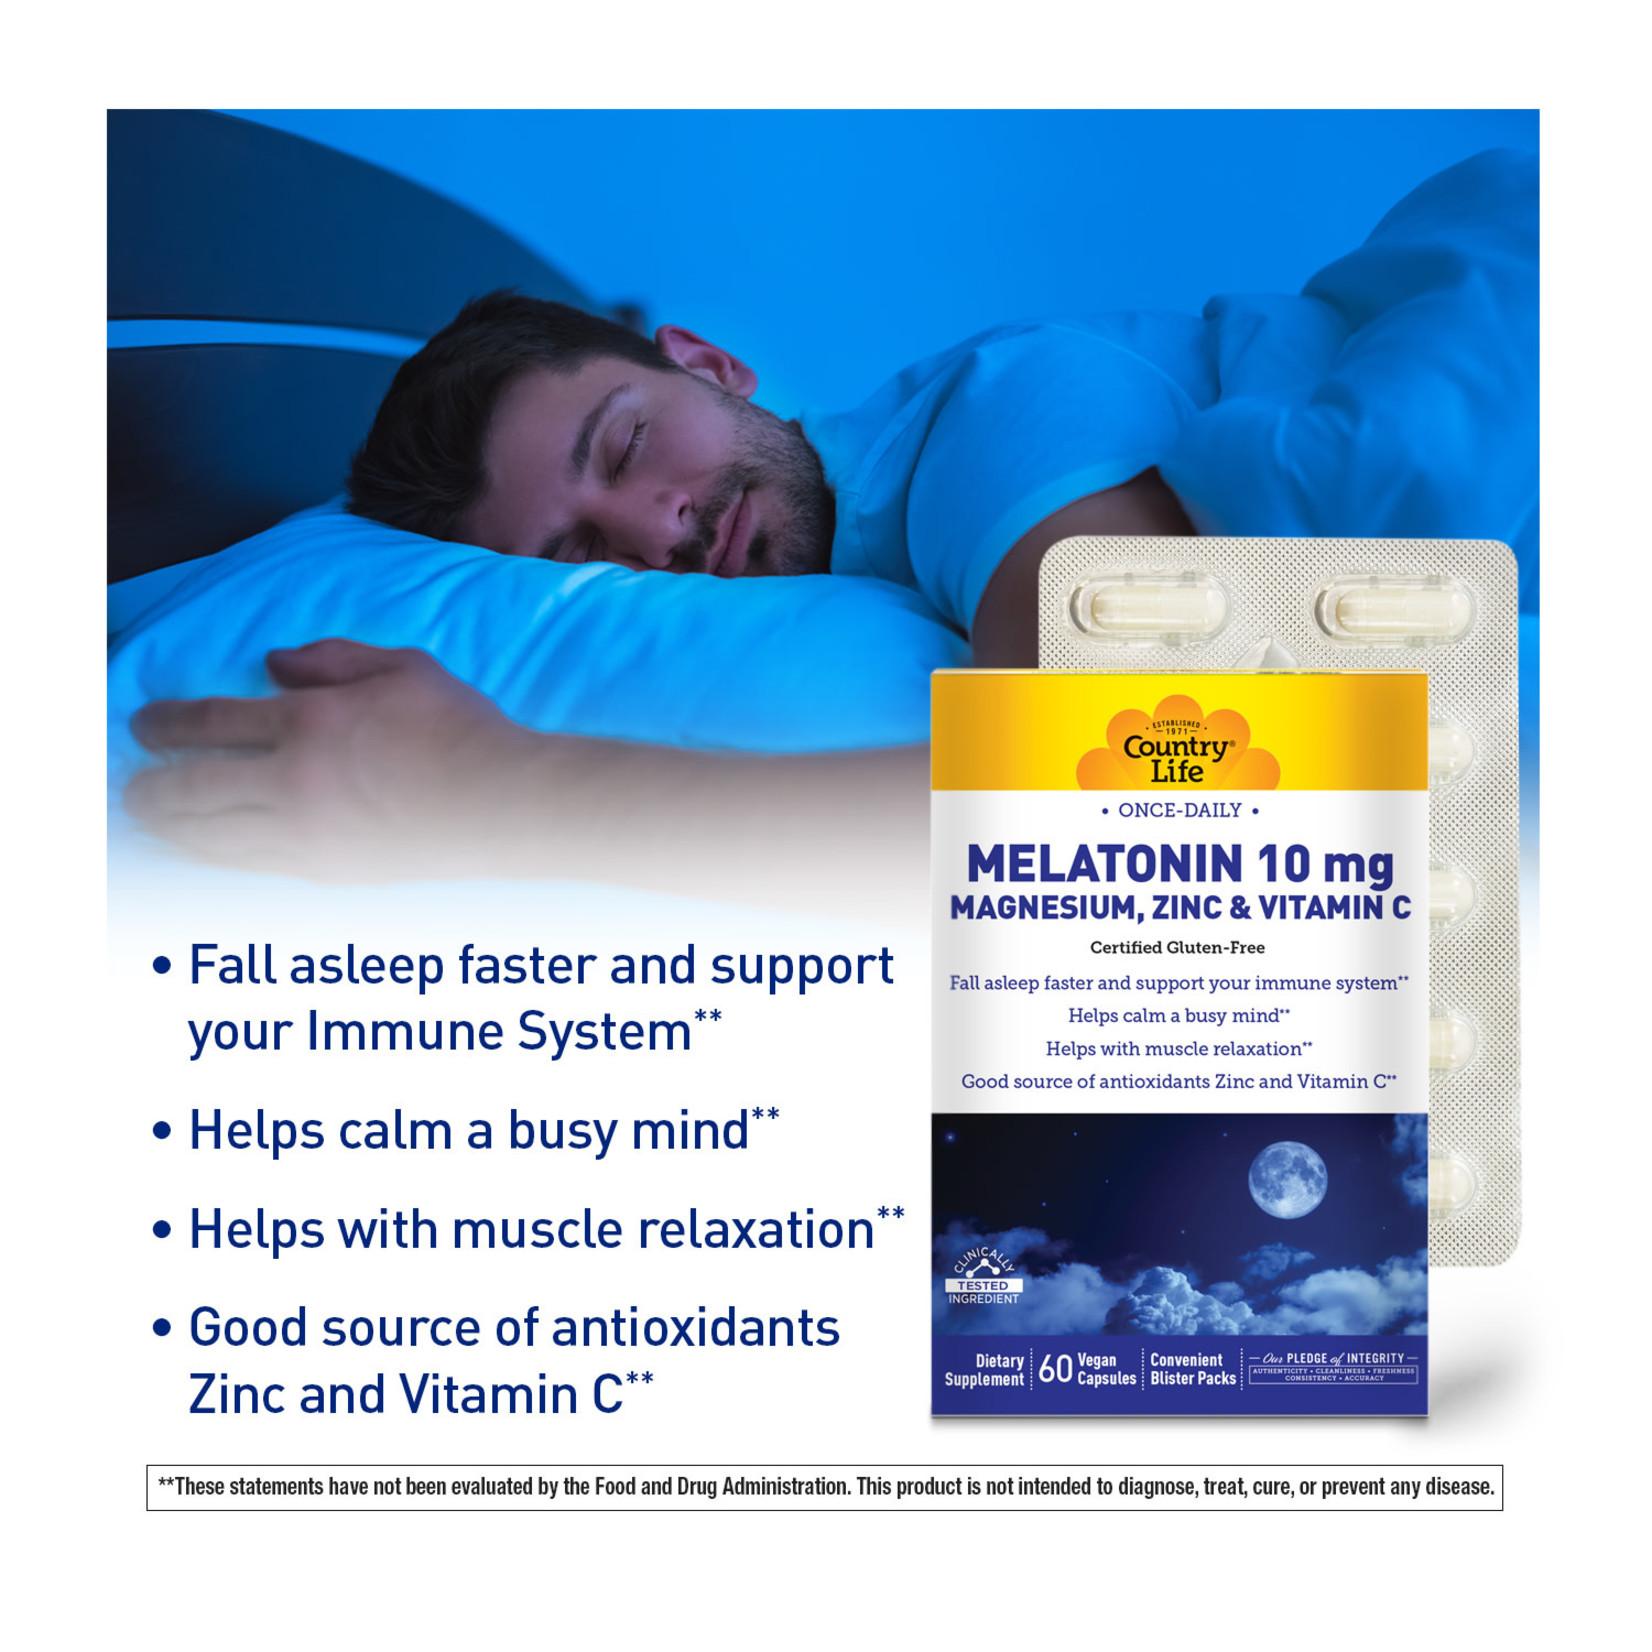 Country Life Country Life Melatonin 10mg  with Magnesium, Zinc, Vitamin C  60 capsules